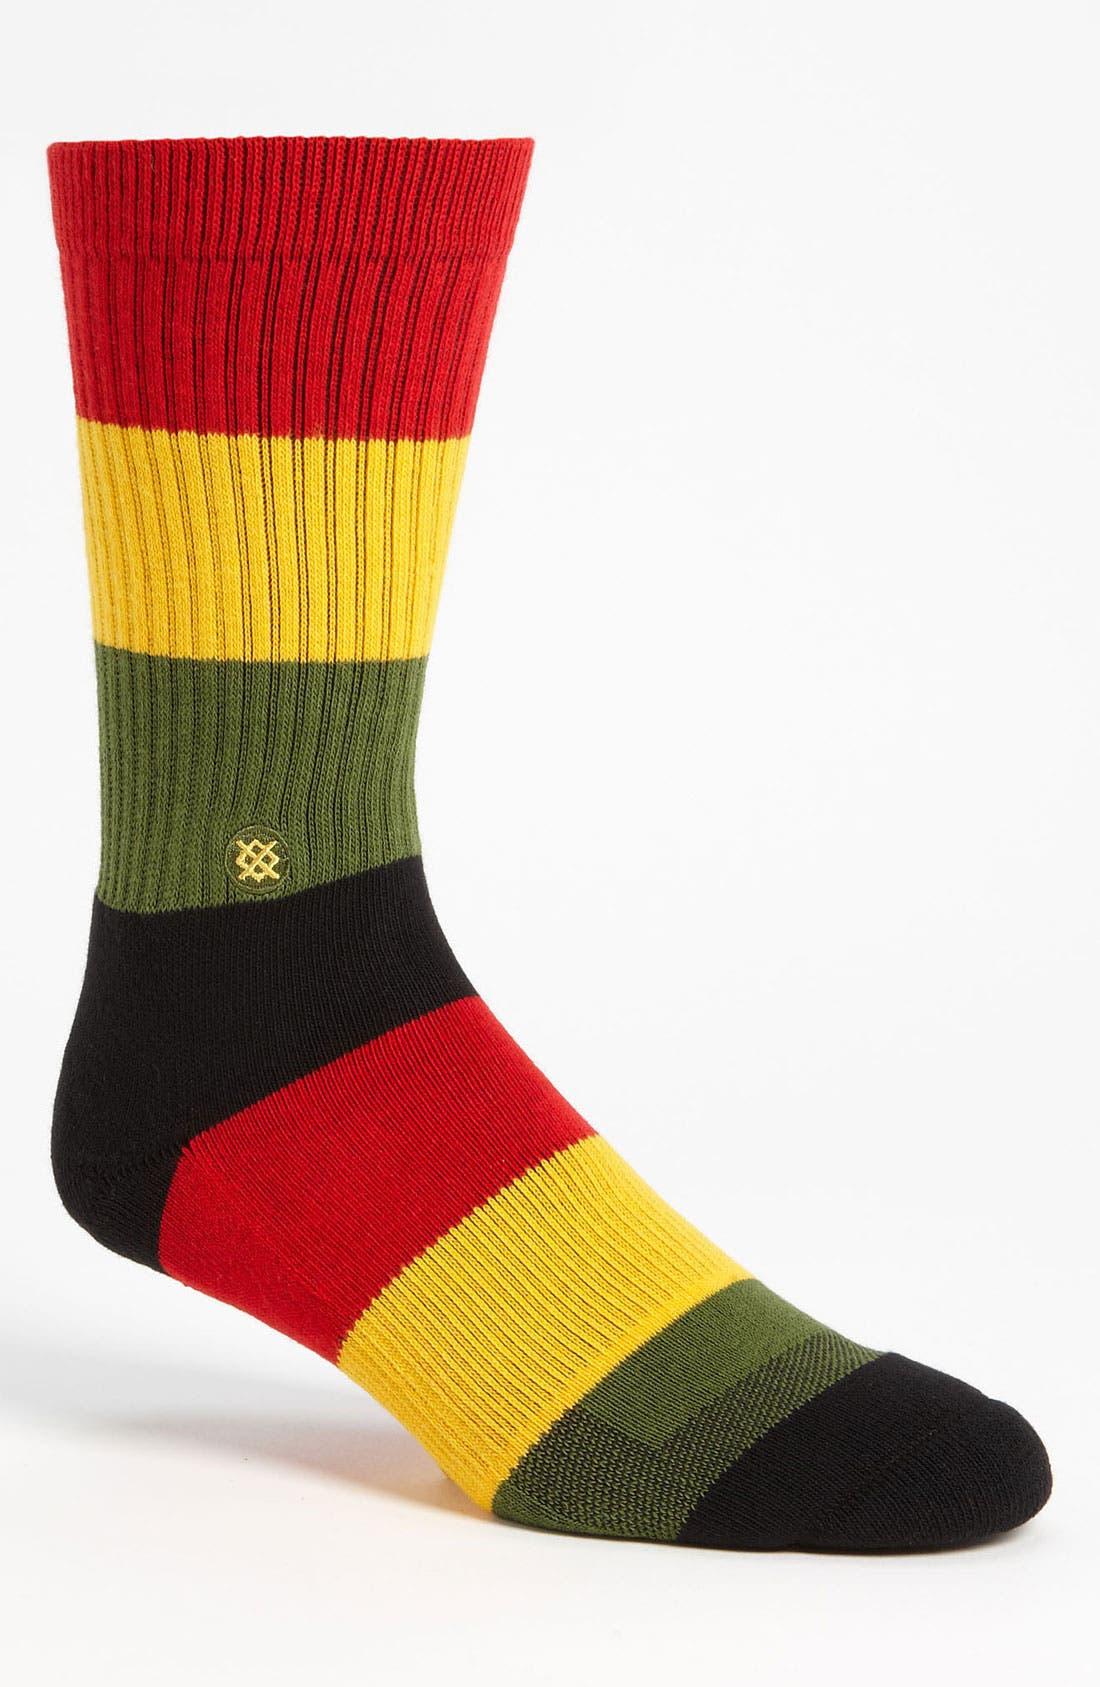 Alternate Image 1 Selected - Stance 'Maytal' Socks